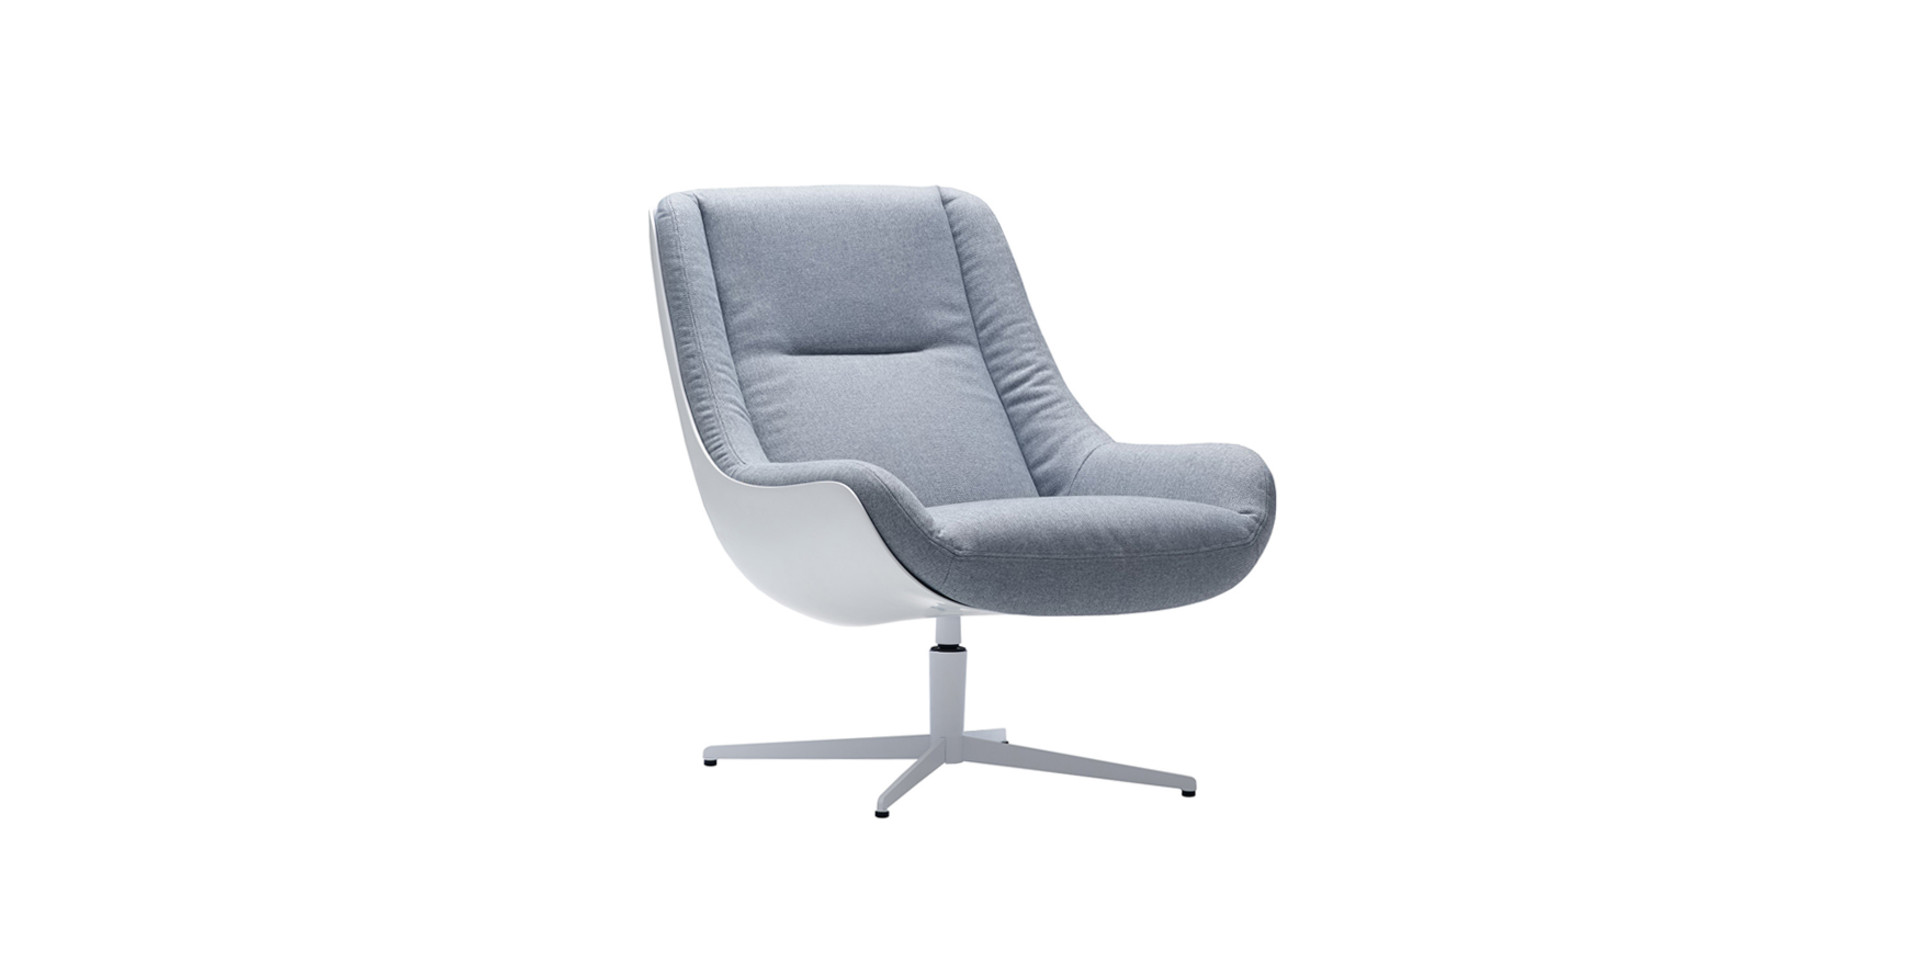 LOVEBIRD_armchair_swivel_black_dover-blue-grey